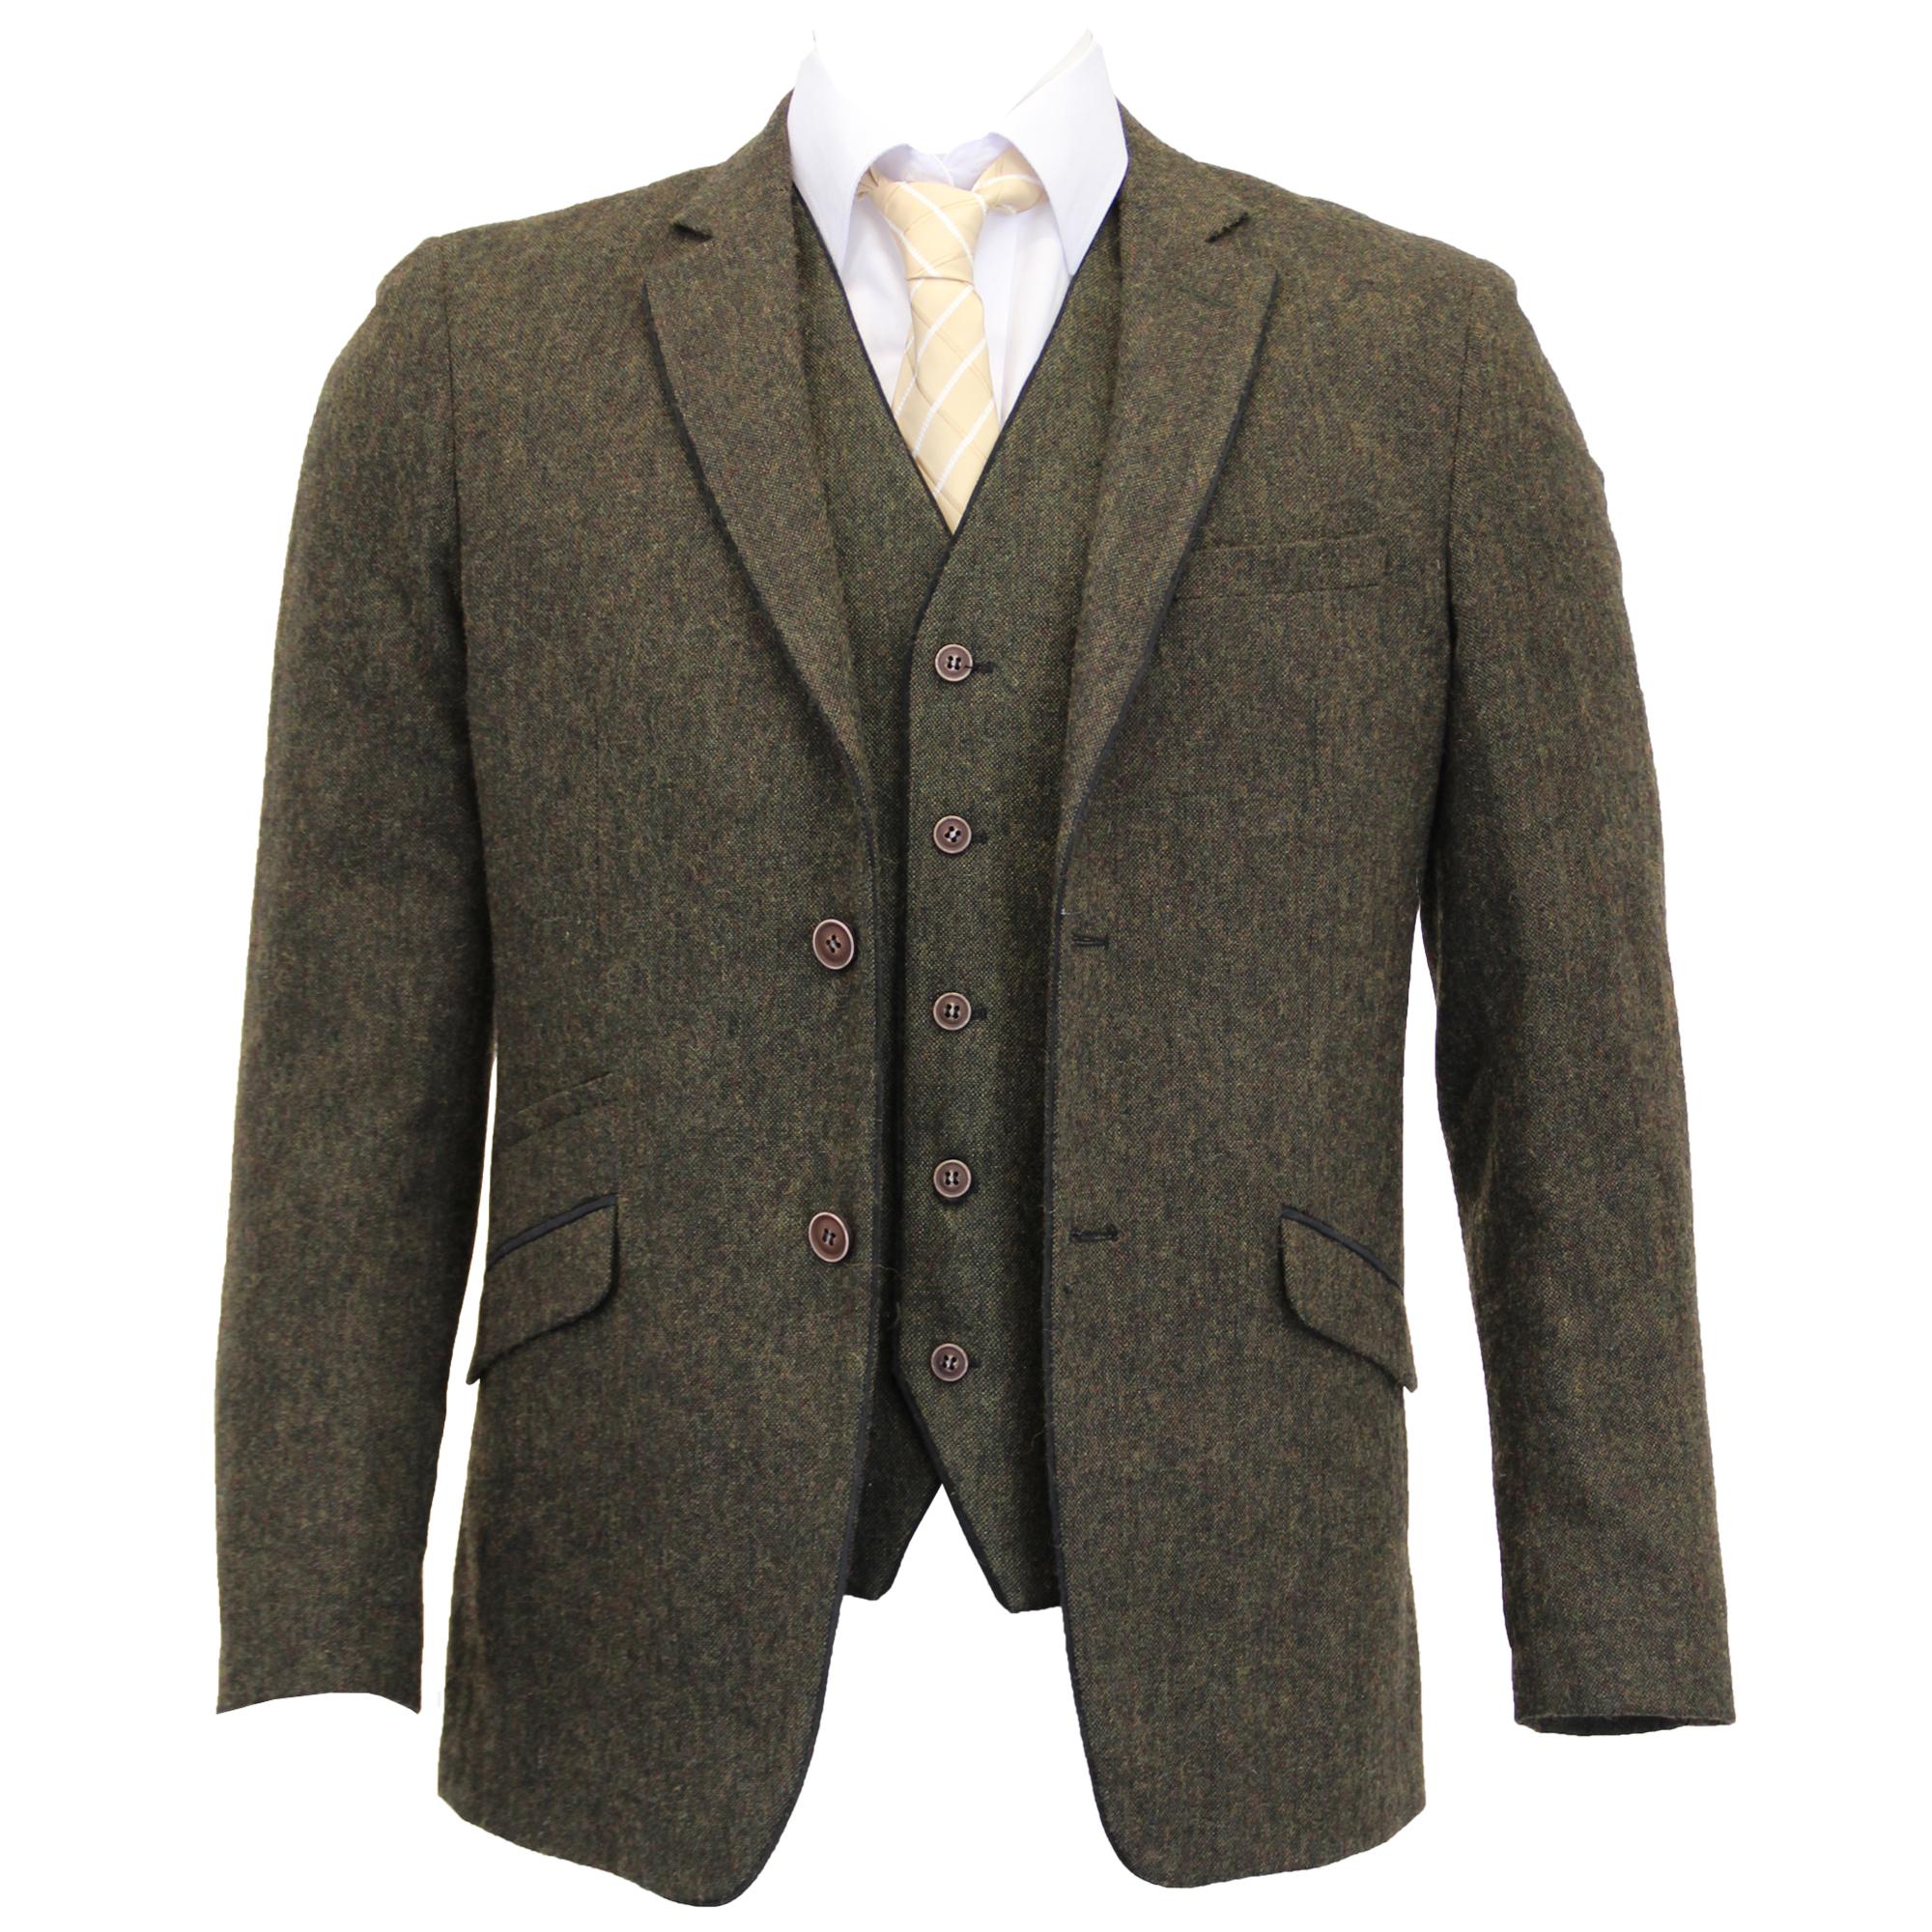 Mezcla-de-lana-para-hombre-3-piezas-trajes-mareno-Blazer-Chaqueta-pantalones-chaleco-Fiesta-Formal miniatura 16